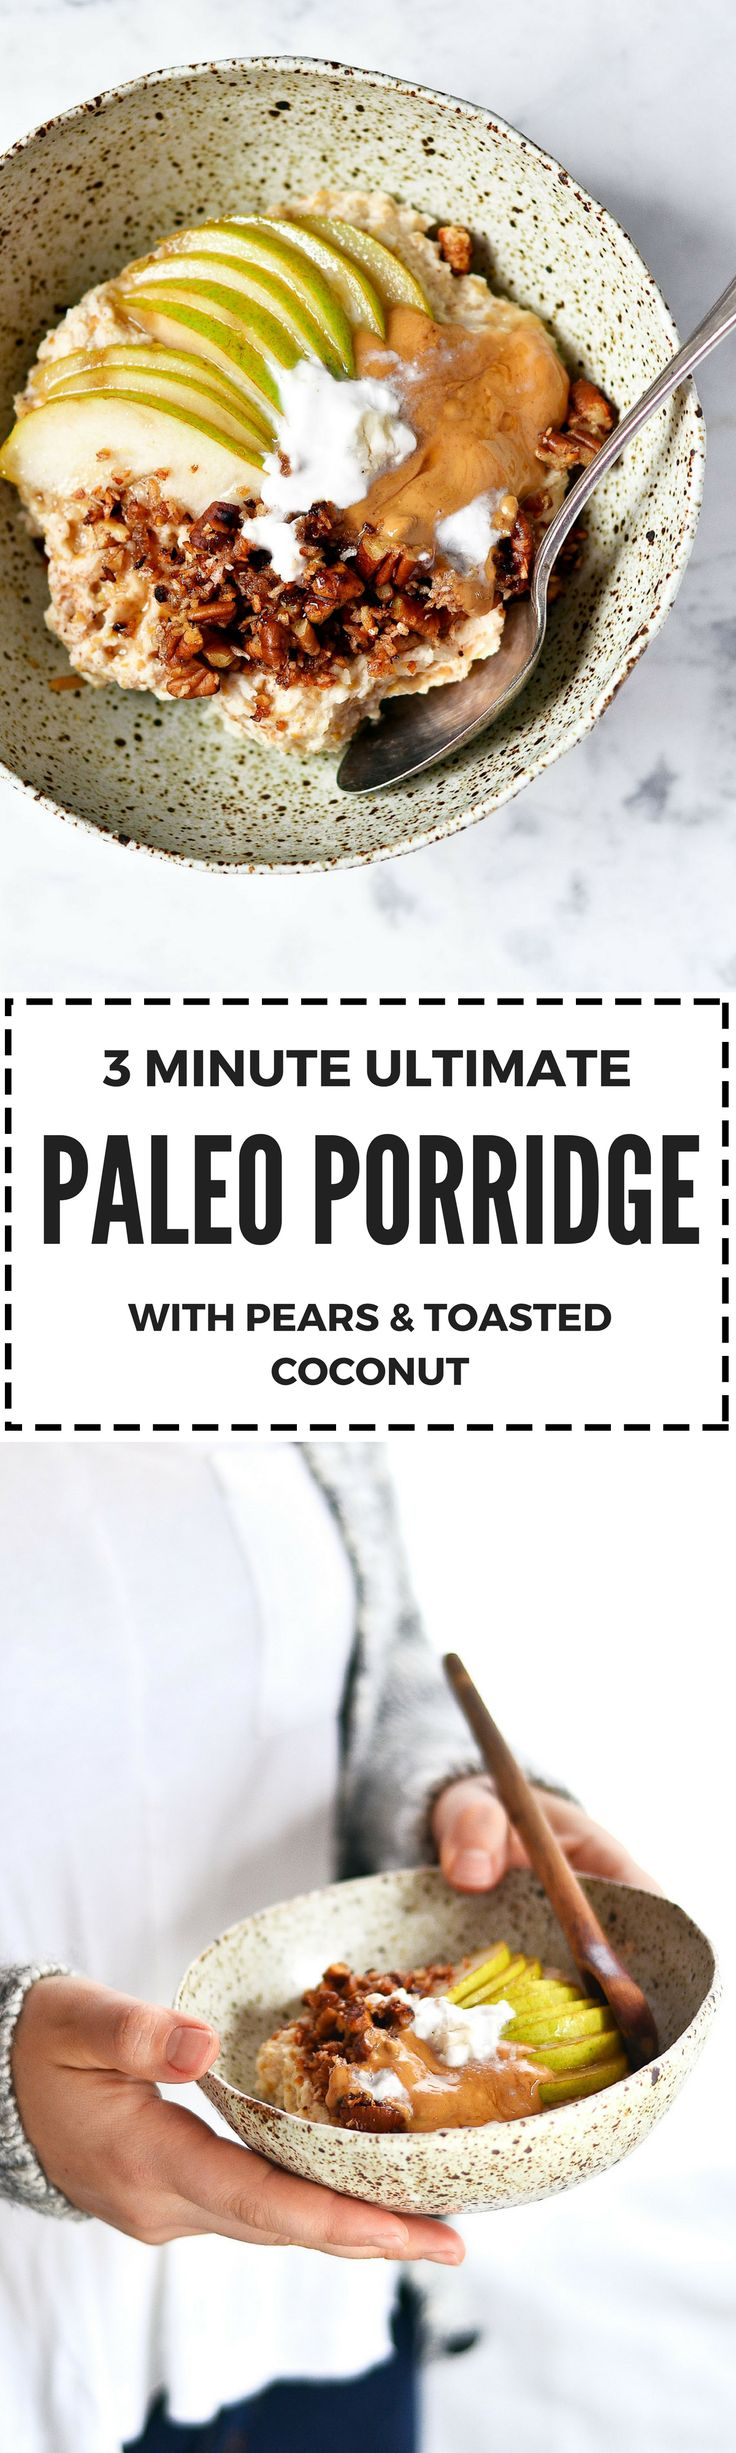 3 minute paleo porridge. Gluten Free, vegan, & grain free! Snuggle up with warm toasty coconut, almond essence, the deep flavors of cinnamon, & pear.